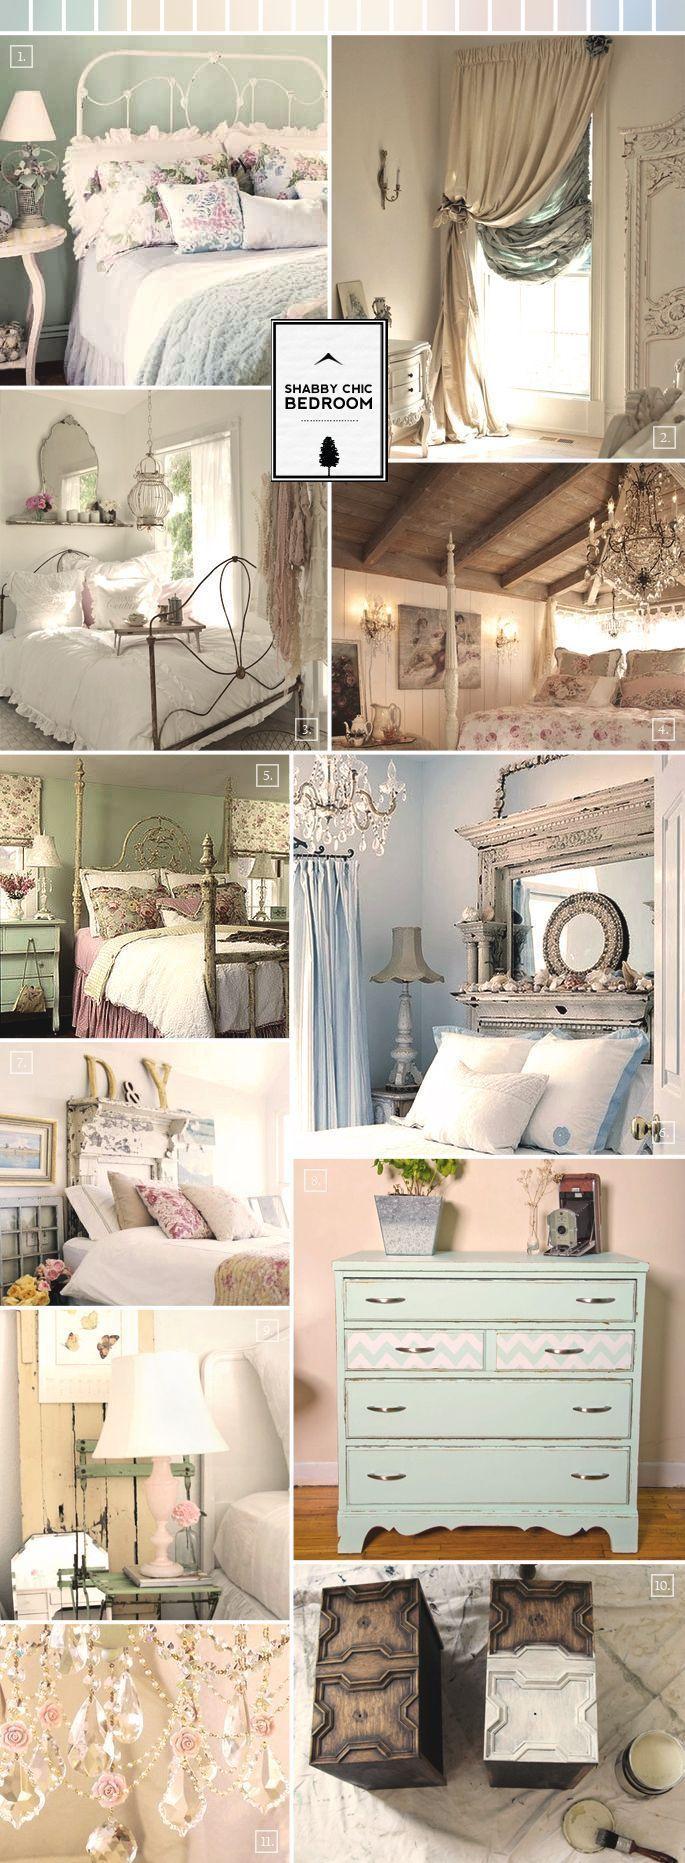 best hub city furniture u mattress gallary images on pinterest